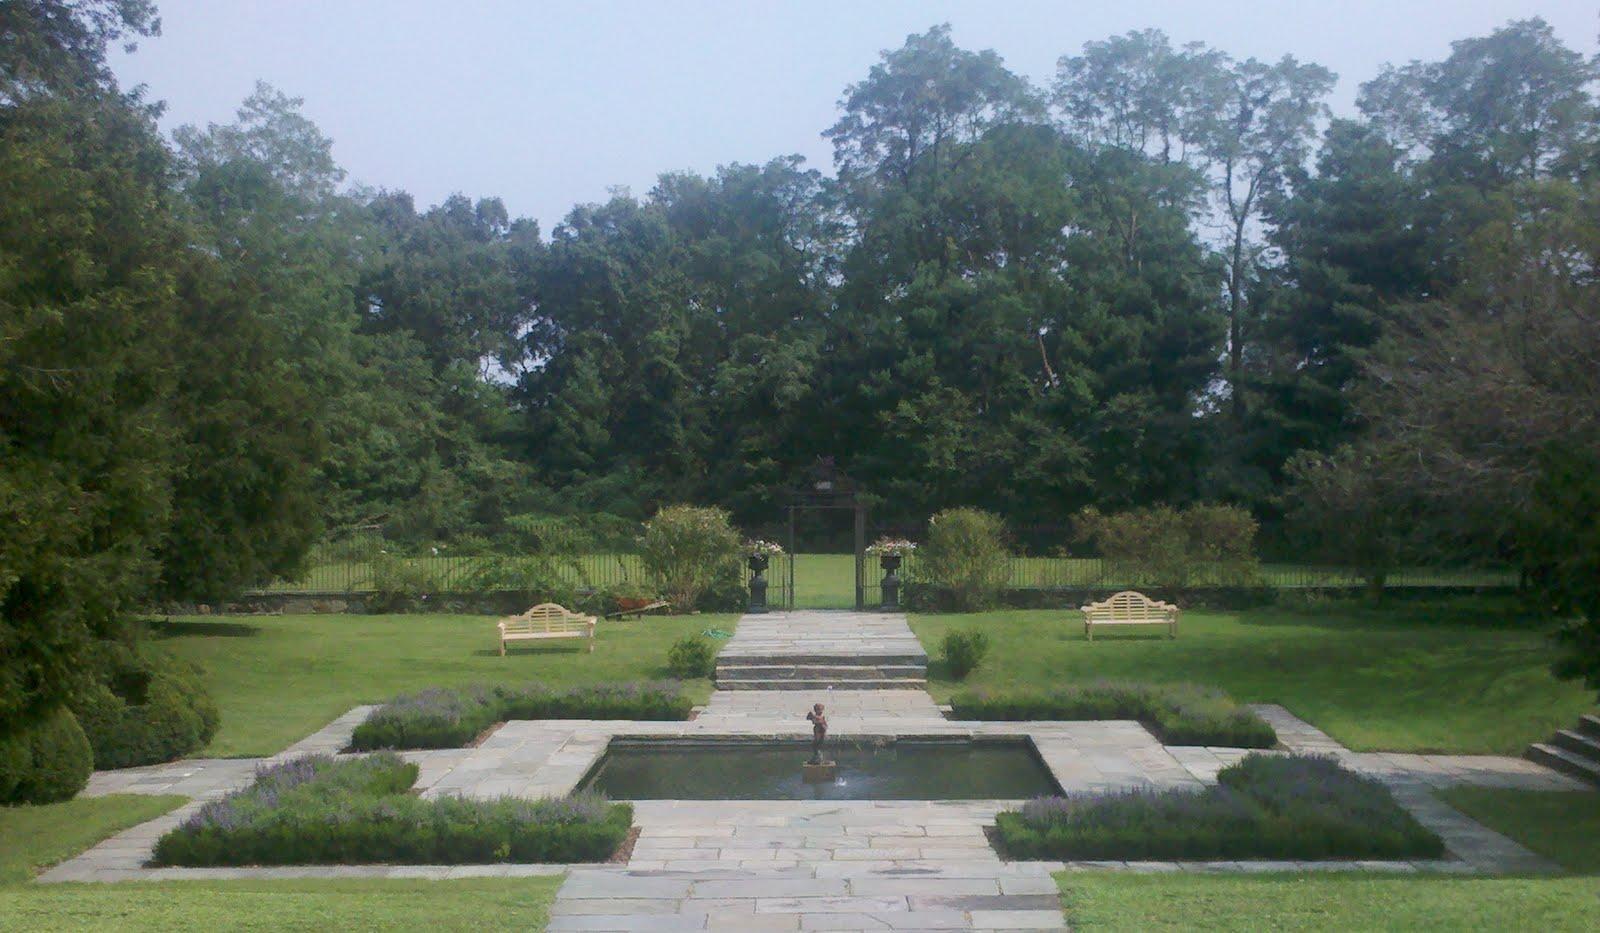 Unique To Nyc Bartow Pell Mansion Bronx Pelham Bay Park